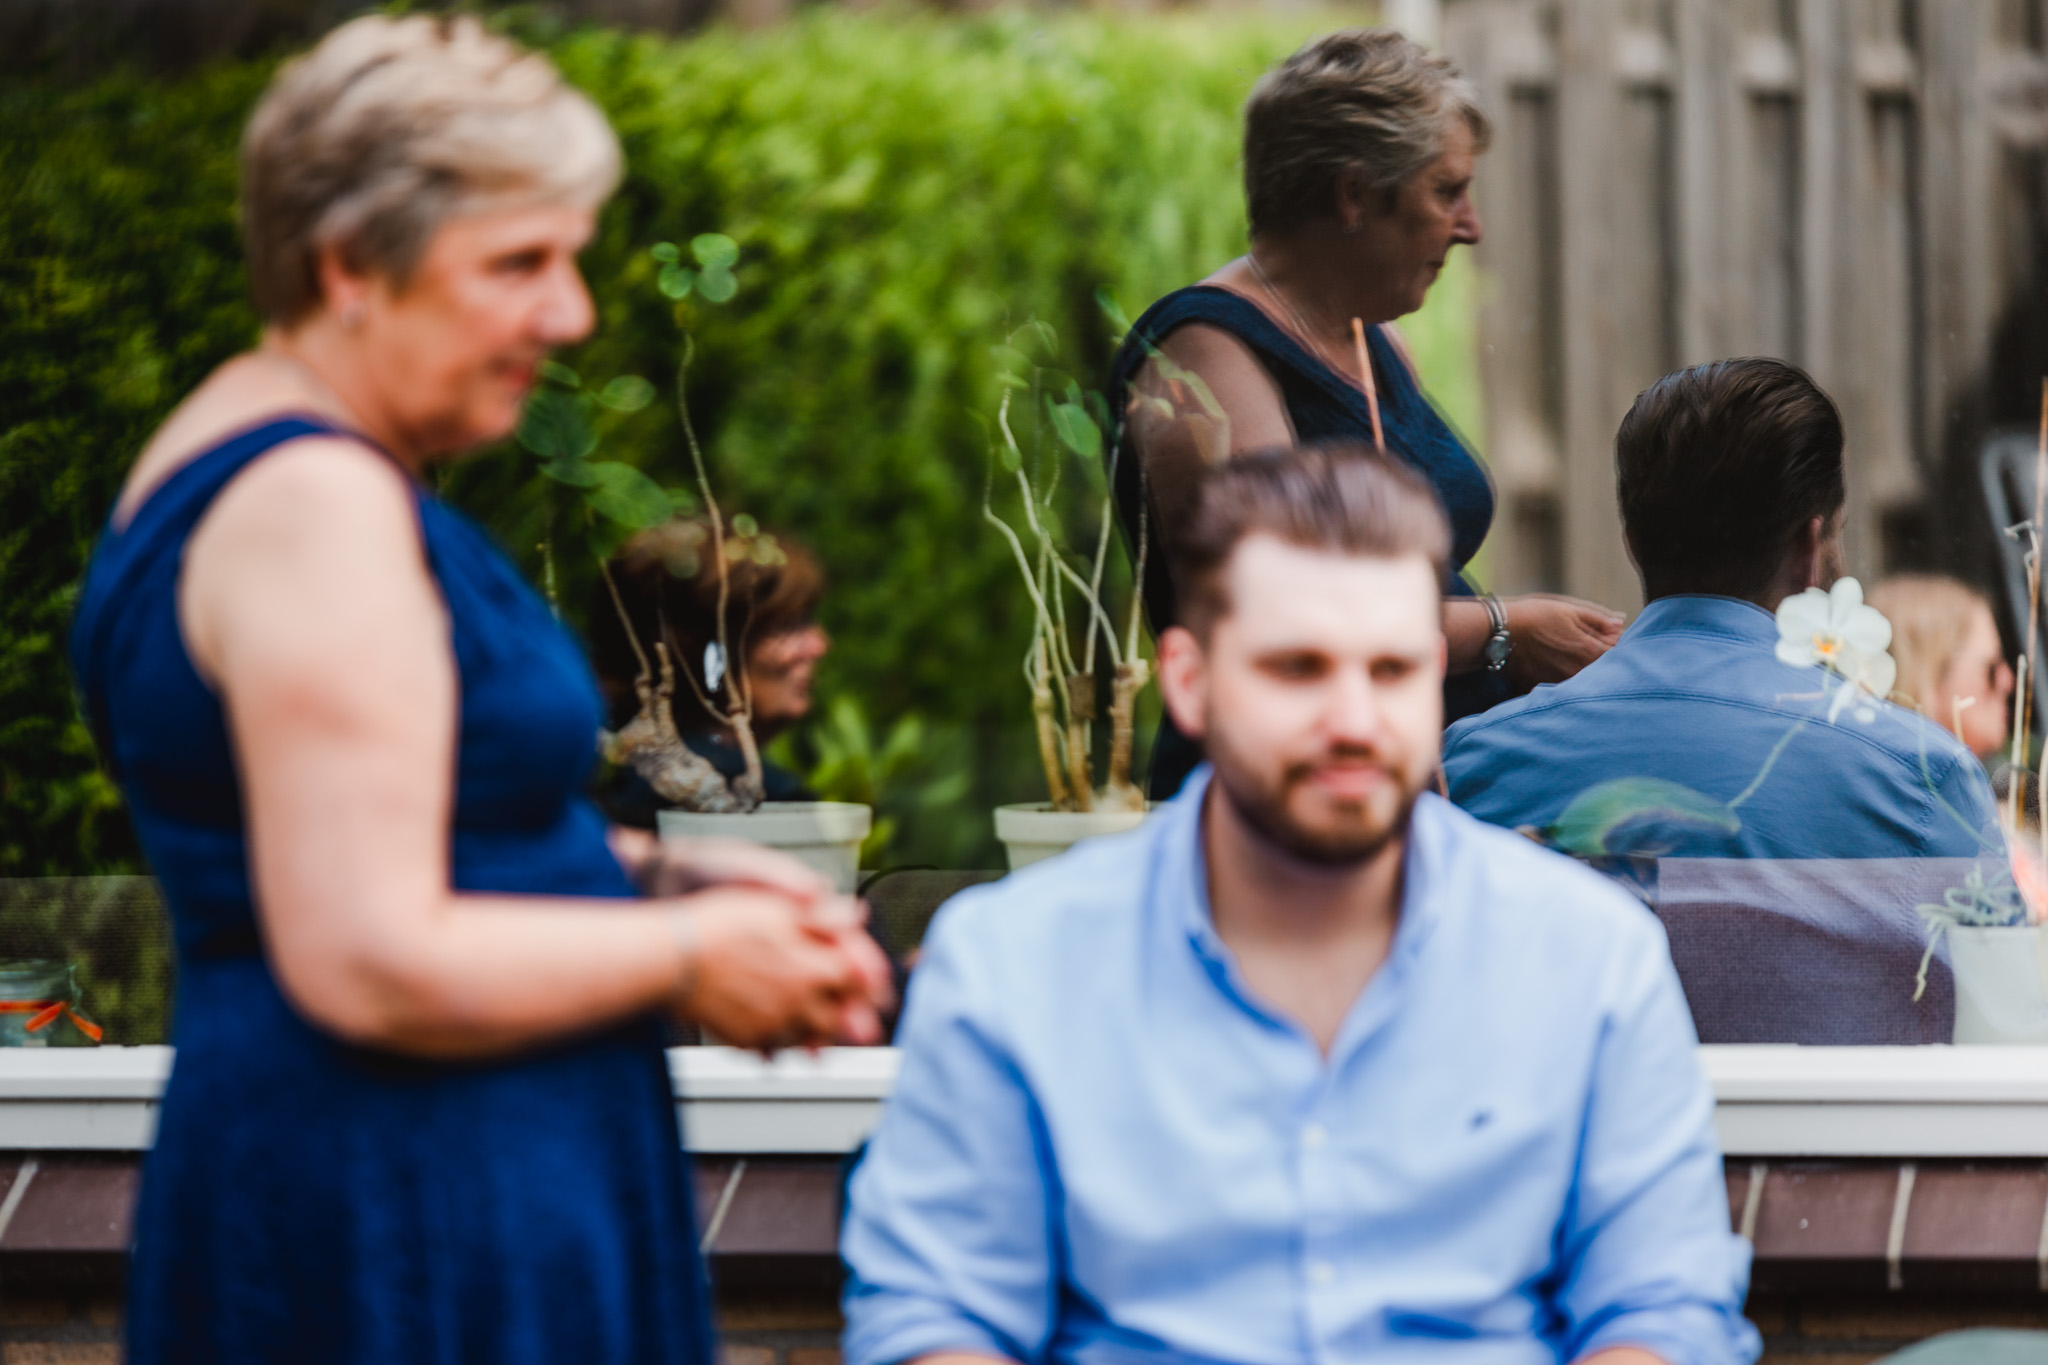 Bruiloft Reportage Geregistreerd Partnerschap Flevoland Lelystad Shot By Sylla 5